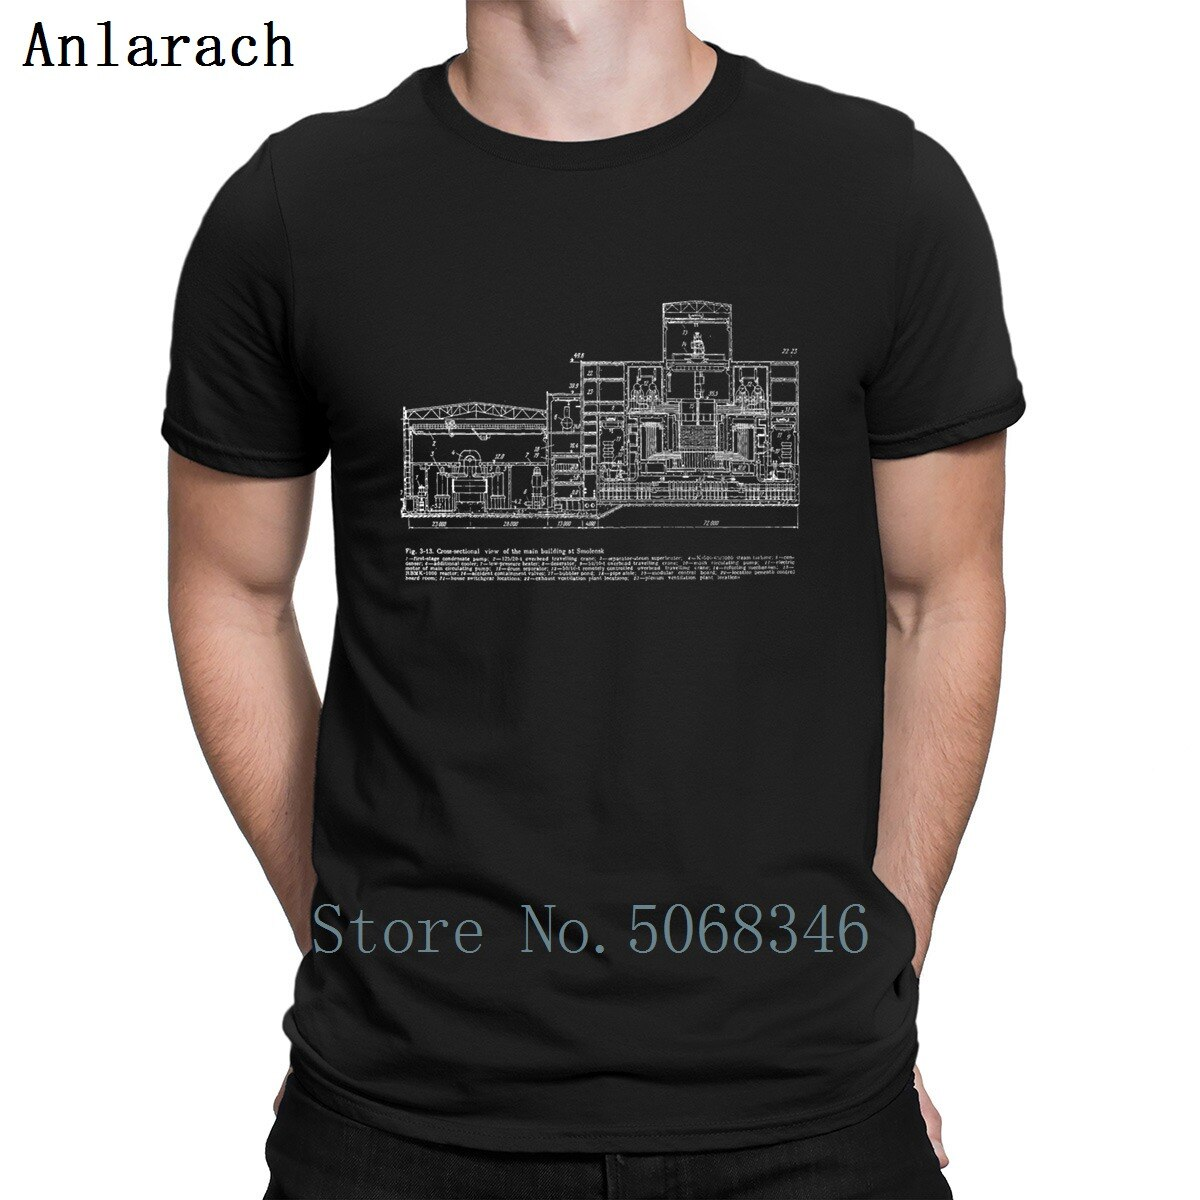 Rbmk 1000 Reactor Blueprint Smolensk Chernóbil camiseta regalo verano Natural moda cuello redondo personaje camisa de manga corta